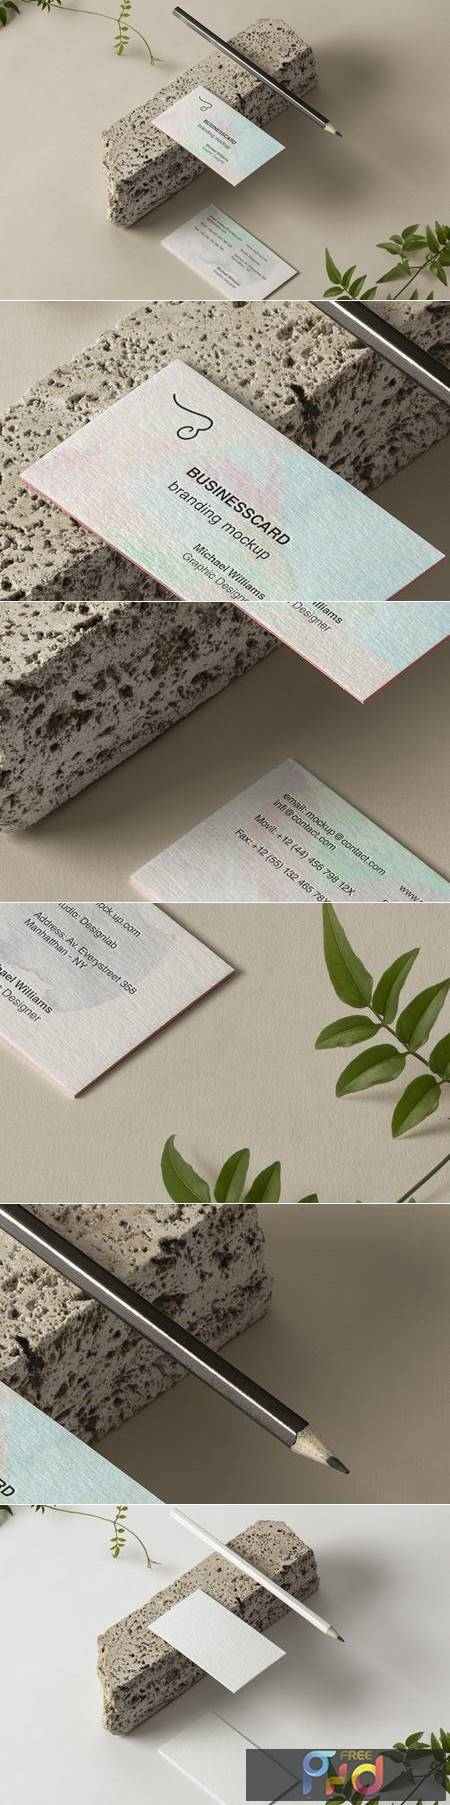 Psd Business Card Branding Mockup 6 1339 1